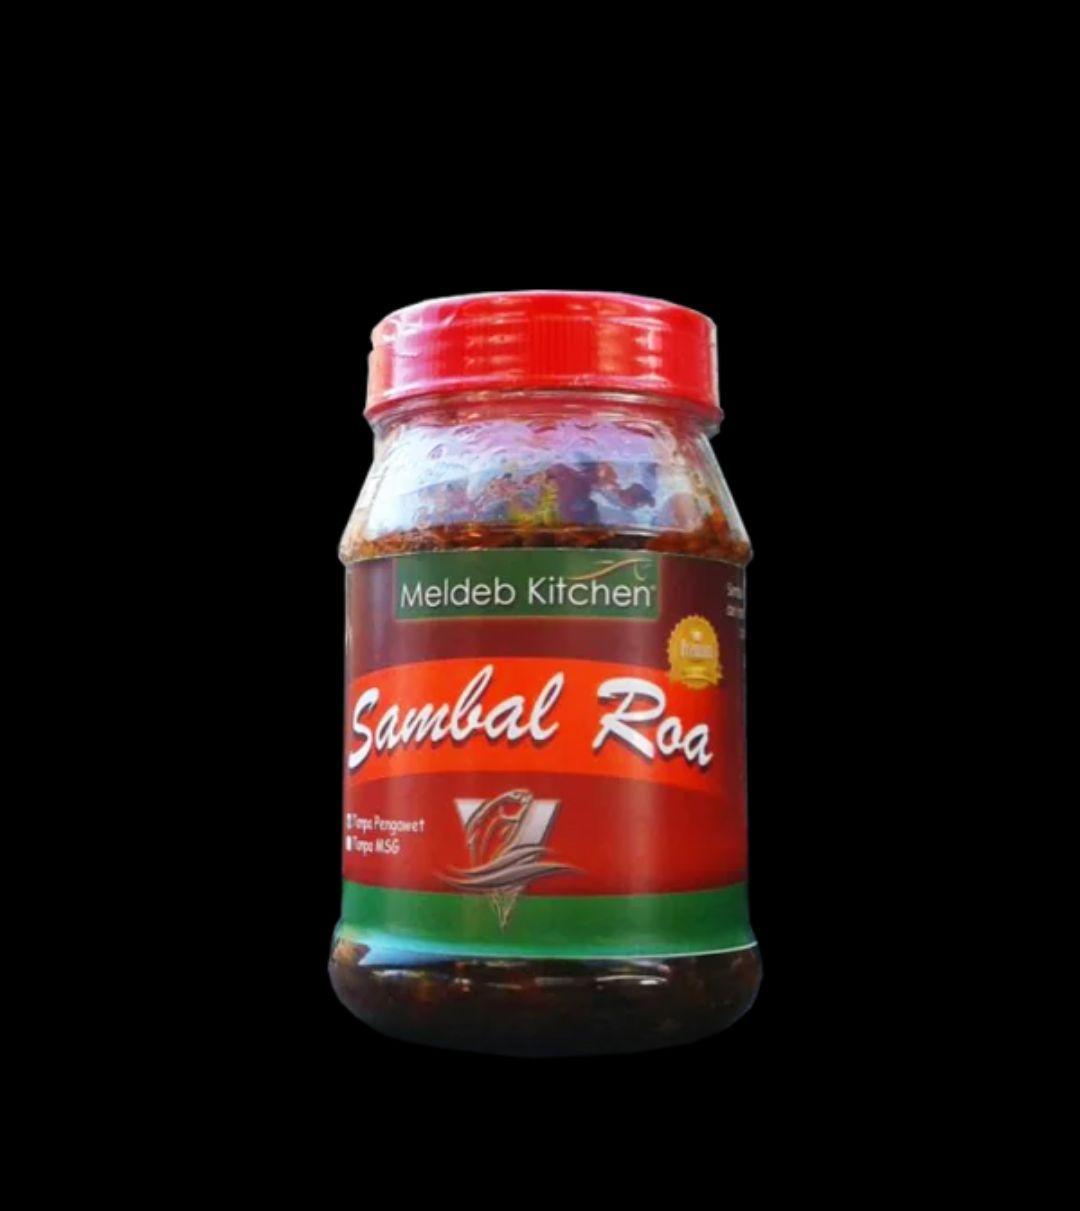 Sambal Roa Manado Jakarta Meldeb Kitchen Asli